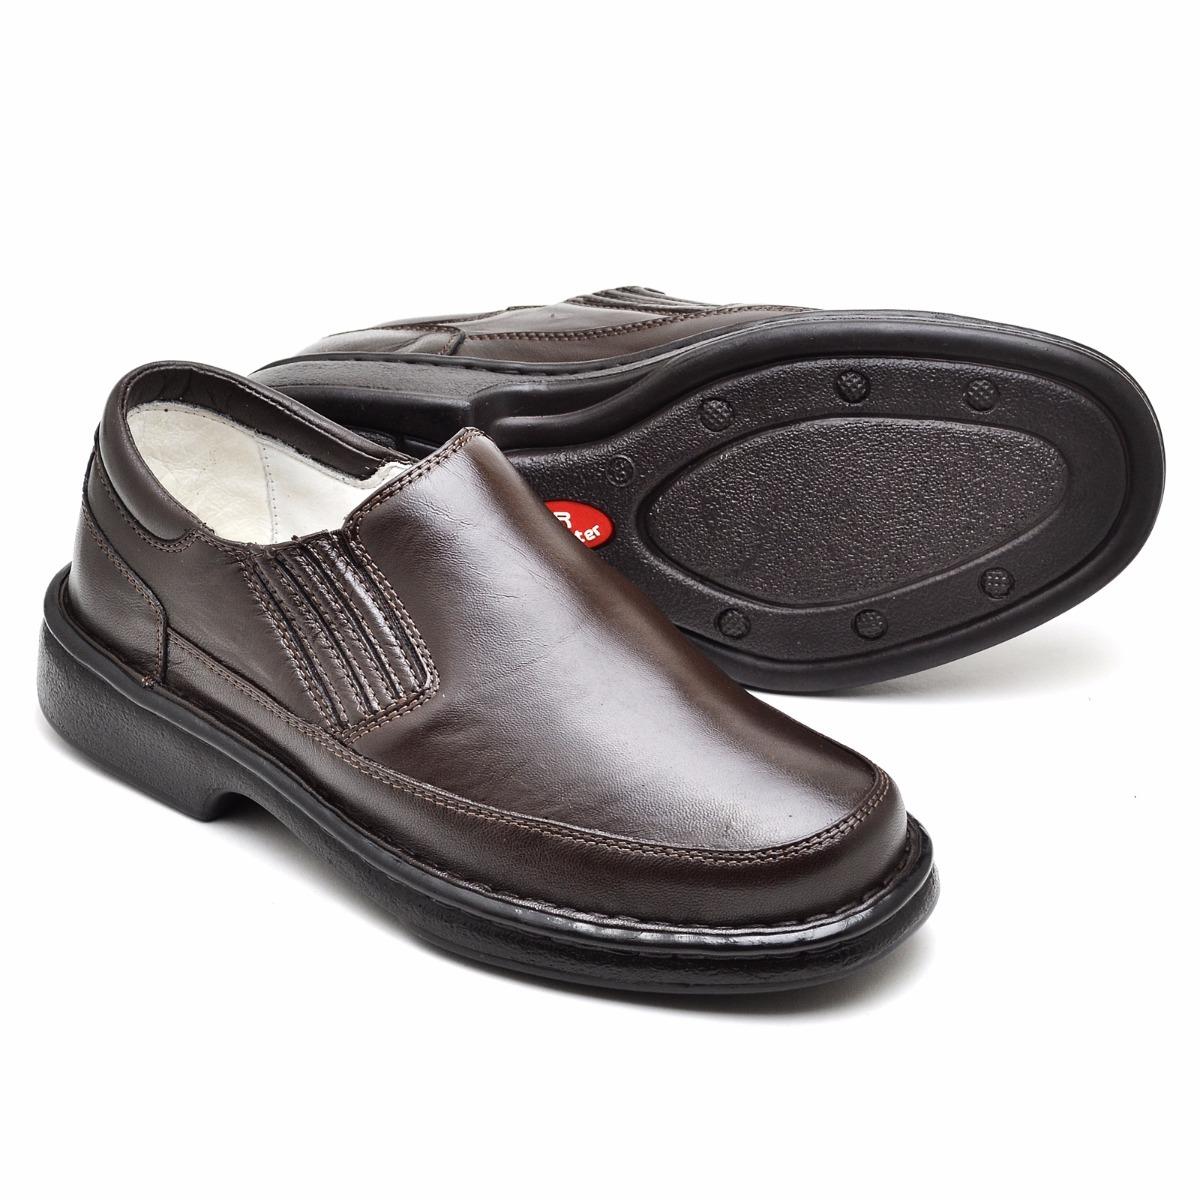 1c294a4ab Sapato Pelica Antstress Para Pés Sinsiveis Diabético 2001 - R$ 169 ...